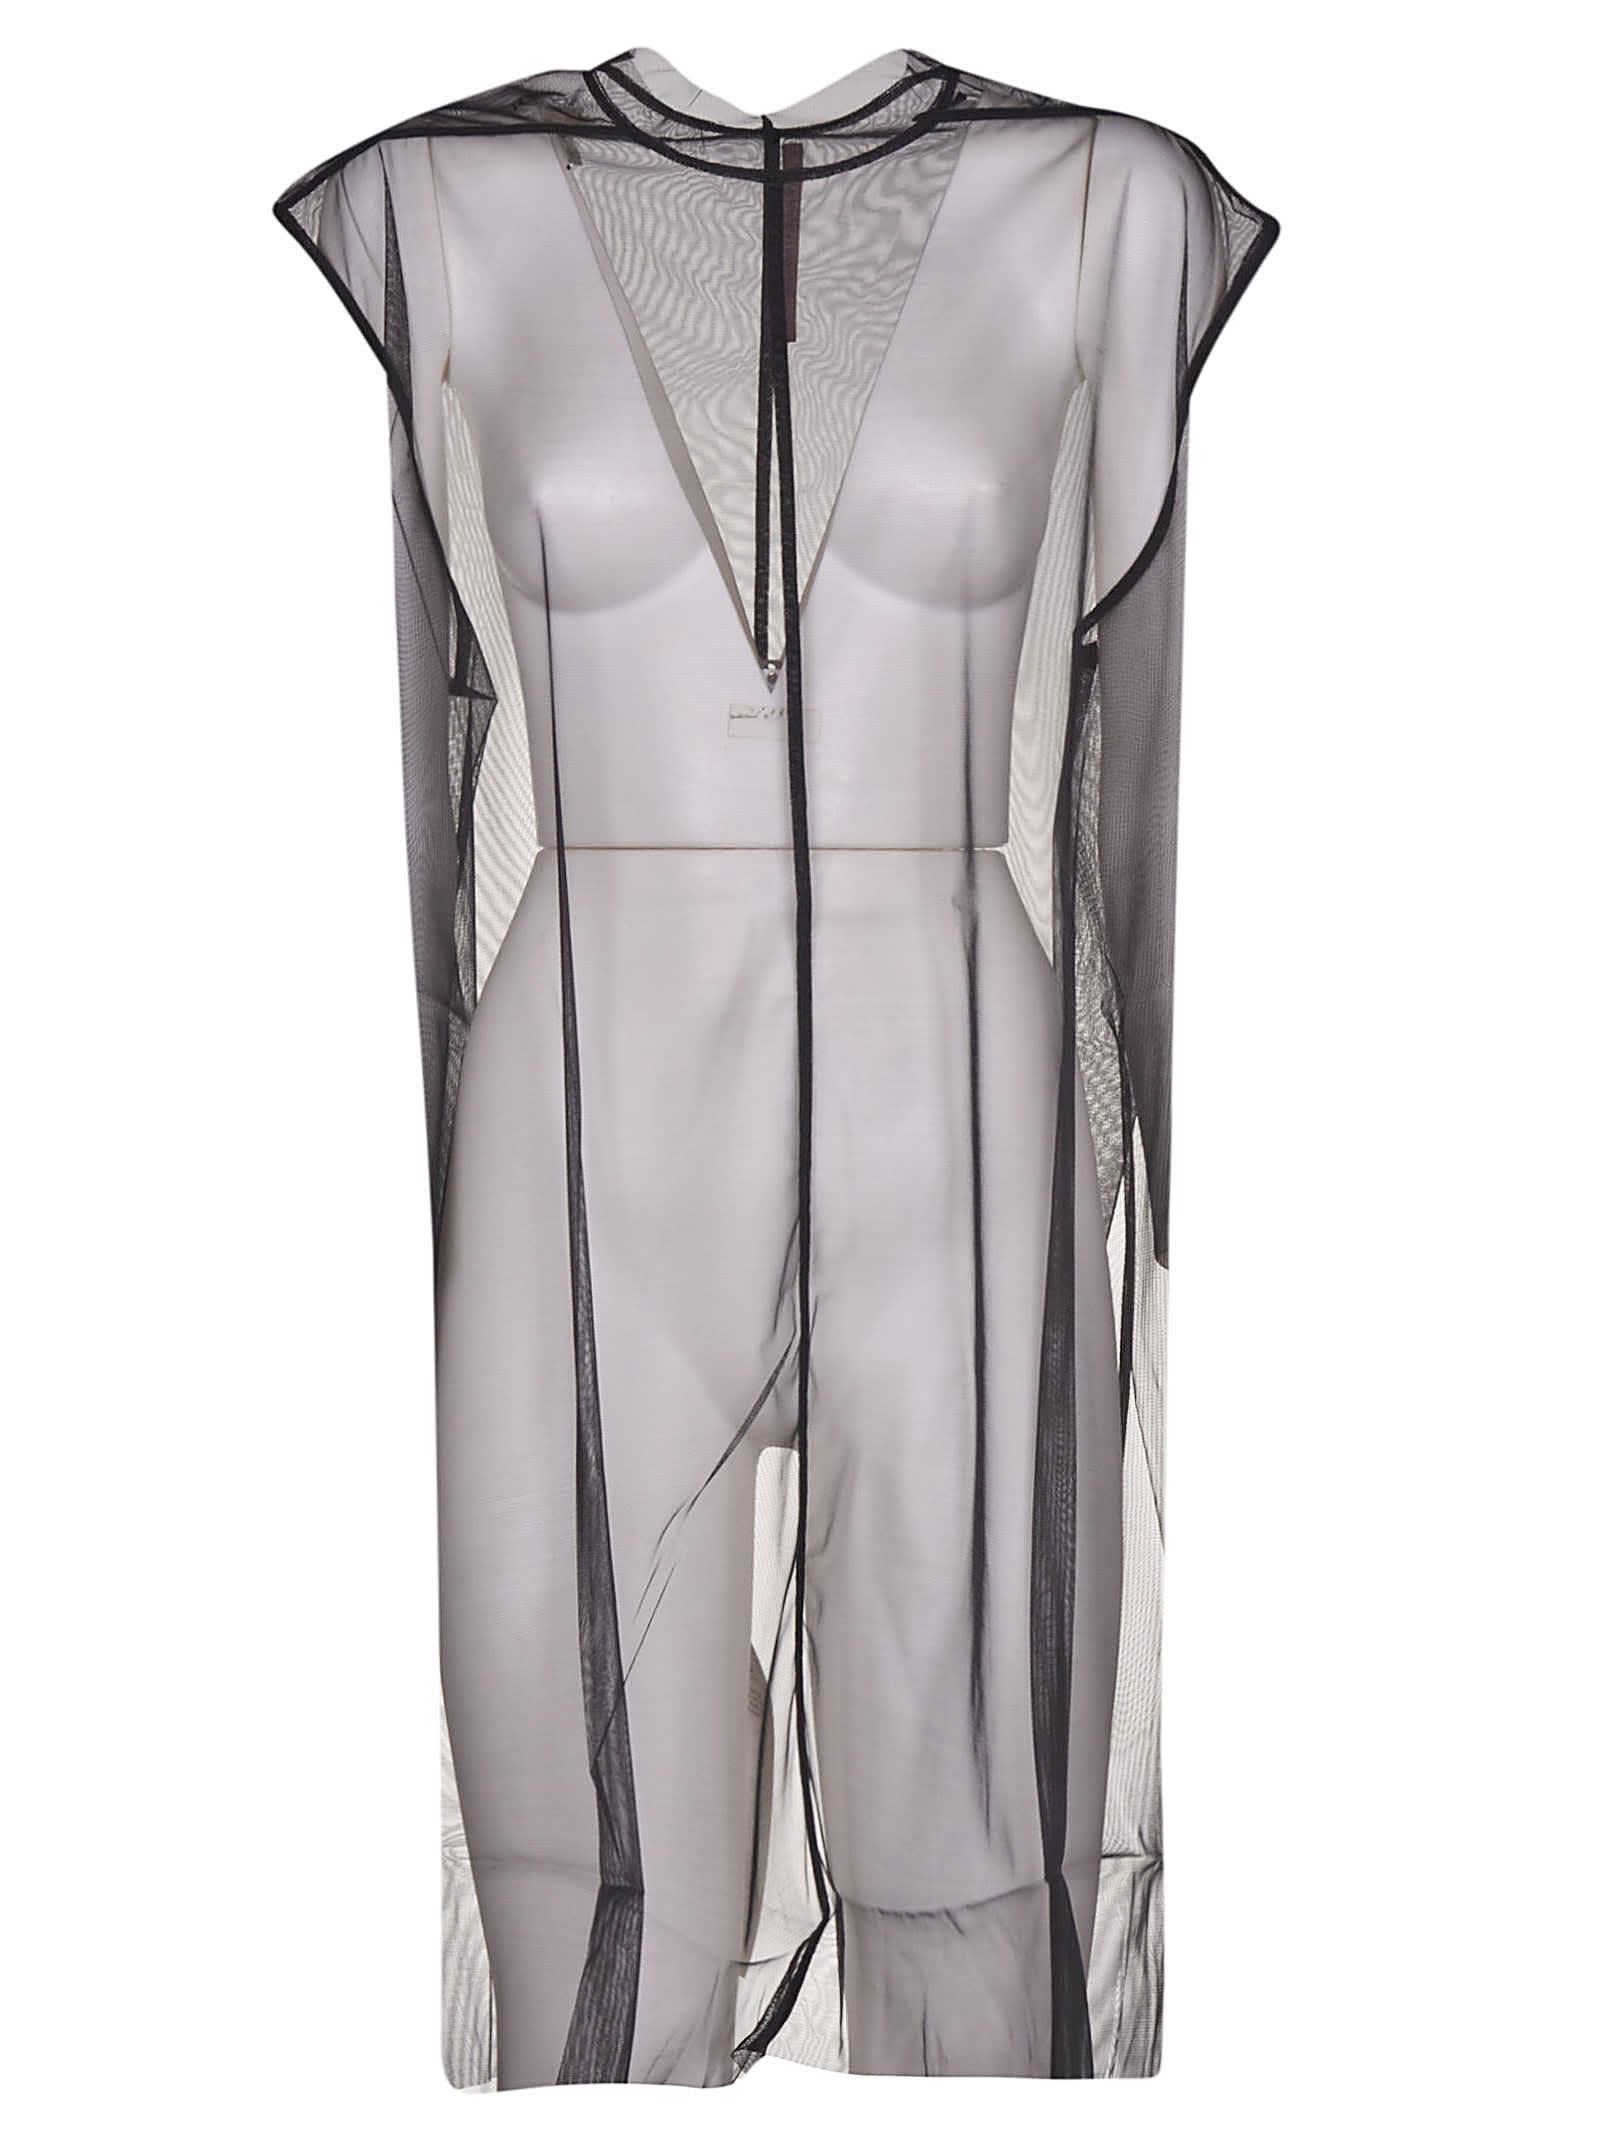 Rick Owens Lilies Babel Dress